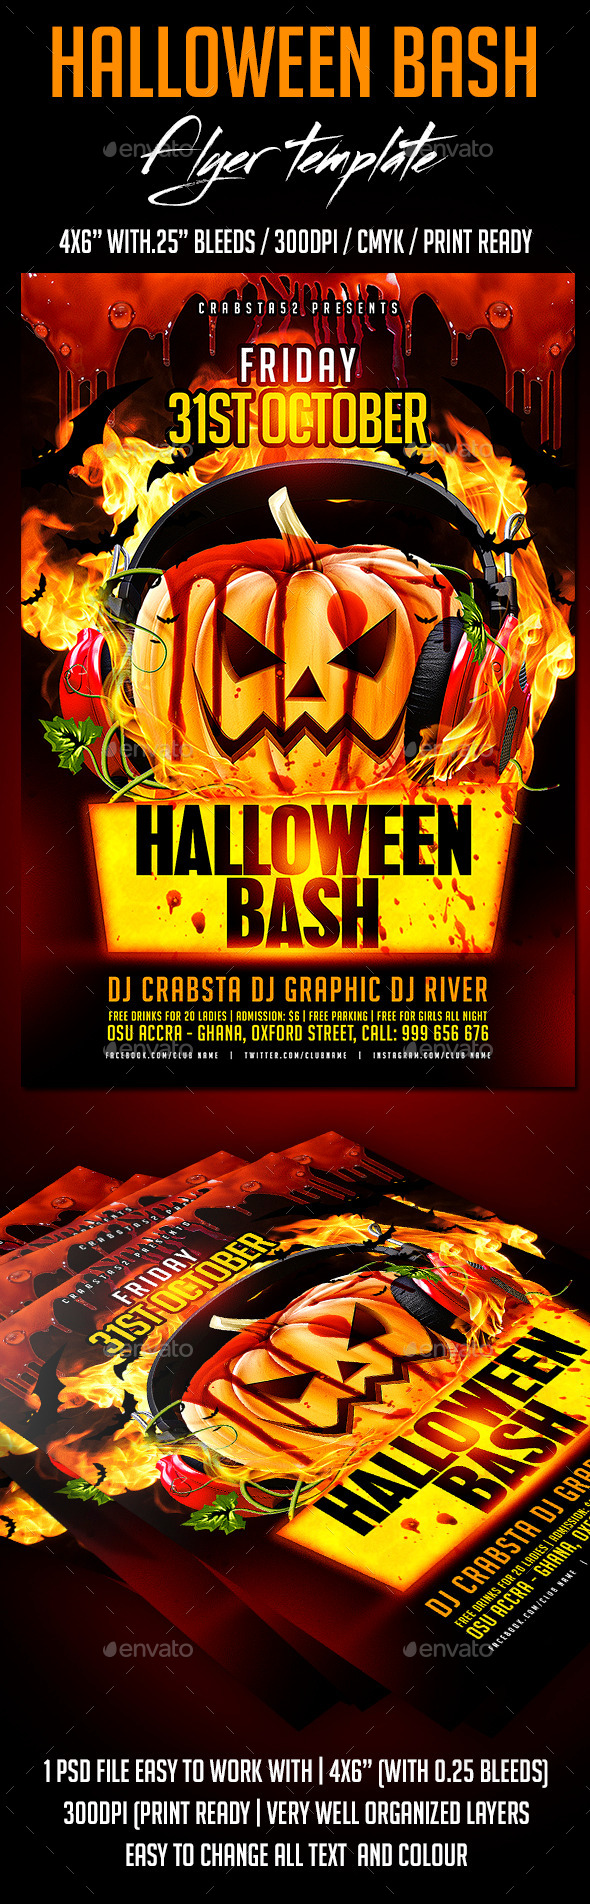 Halloween Bash Flyer Template - Flyers Print Templates